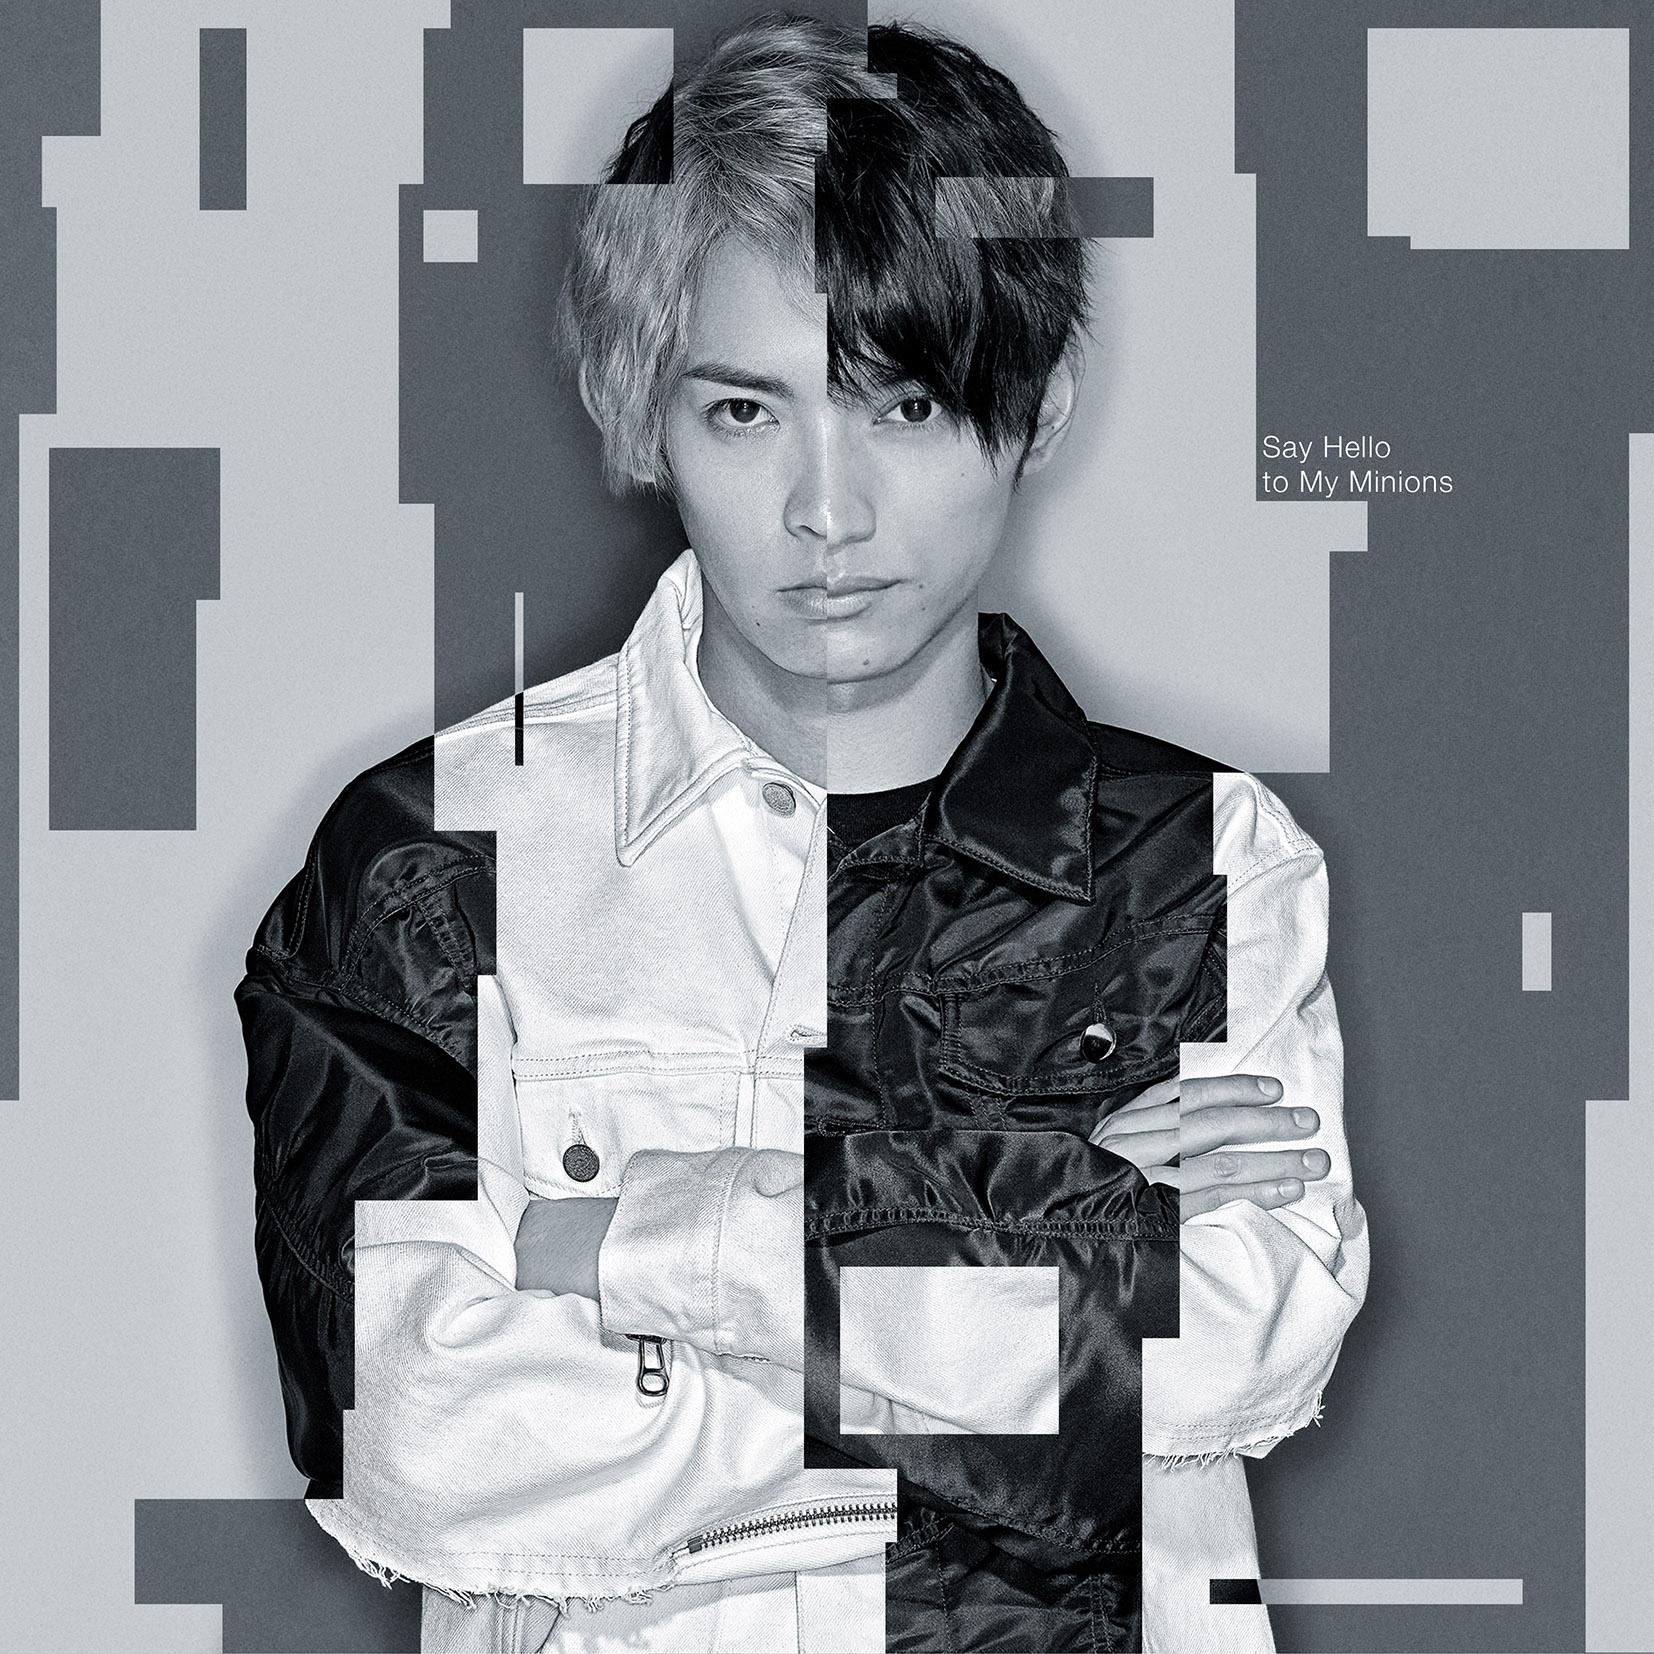 SKY-HI×SALU 新曲MV公開! 渋谷サイファーにゲリラ参加した映像も